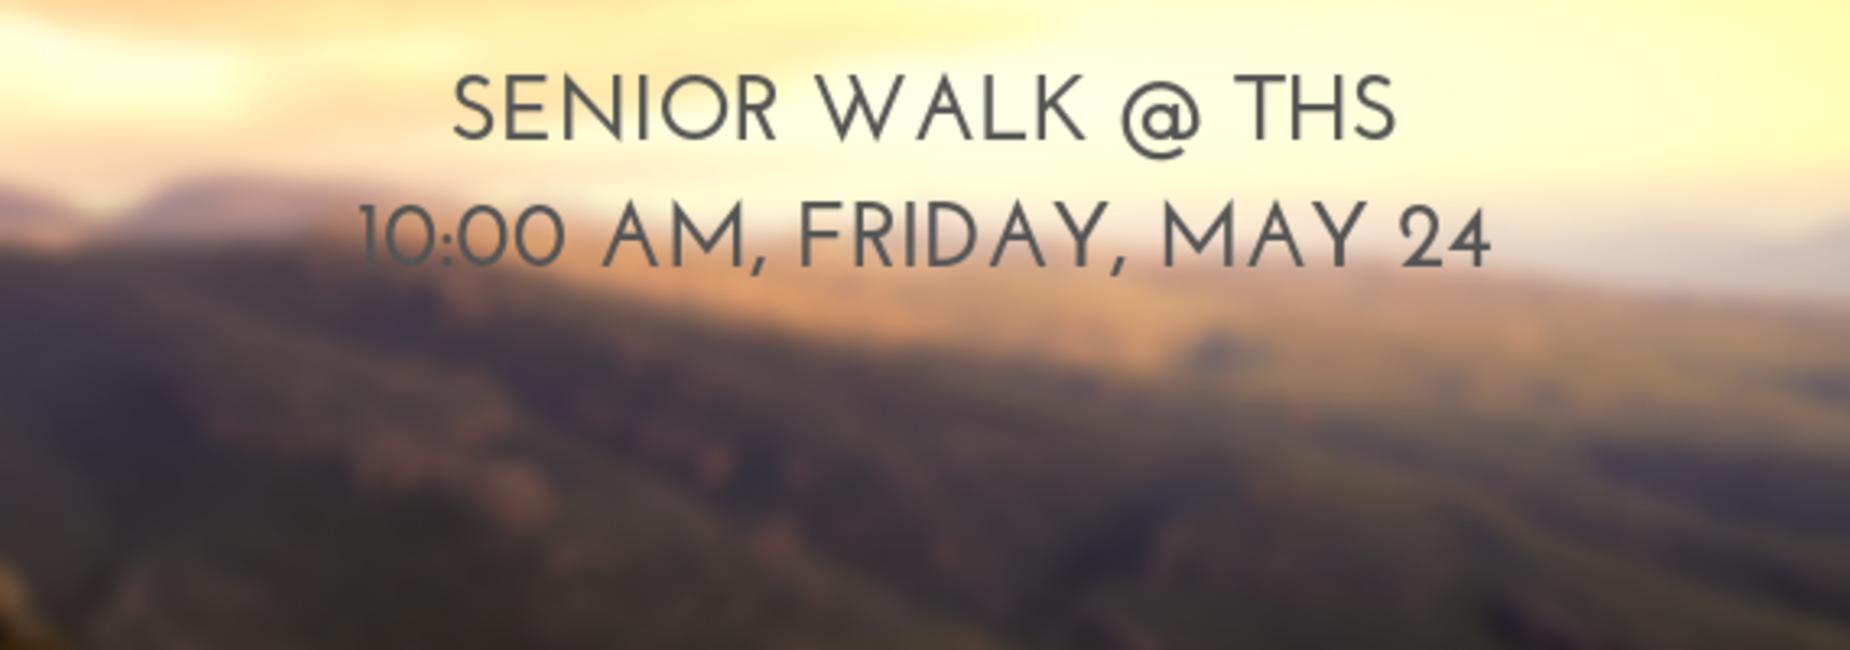 Senior Walk Information: Friday, @ THS, 10:00